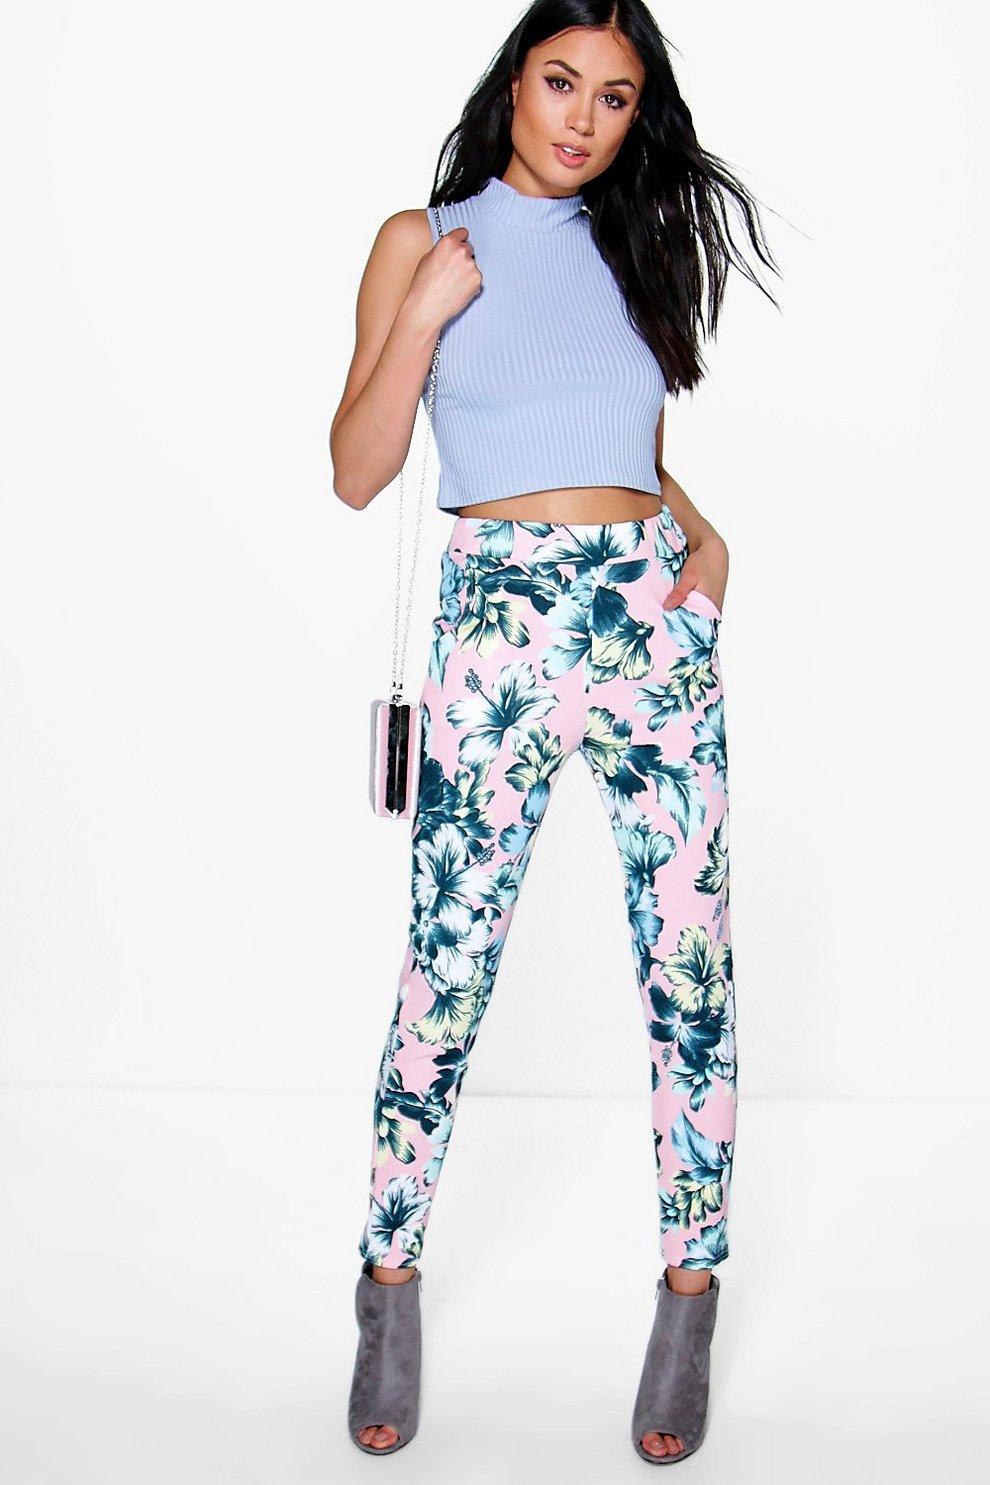 Pantaloni Skinny Yasmin pastello con motivi floreali  767505a9c531